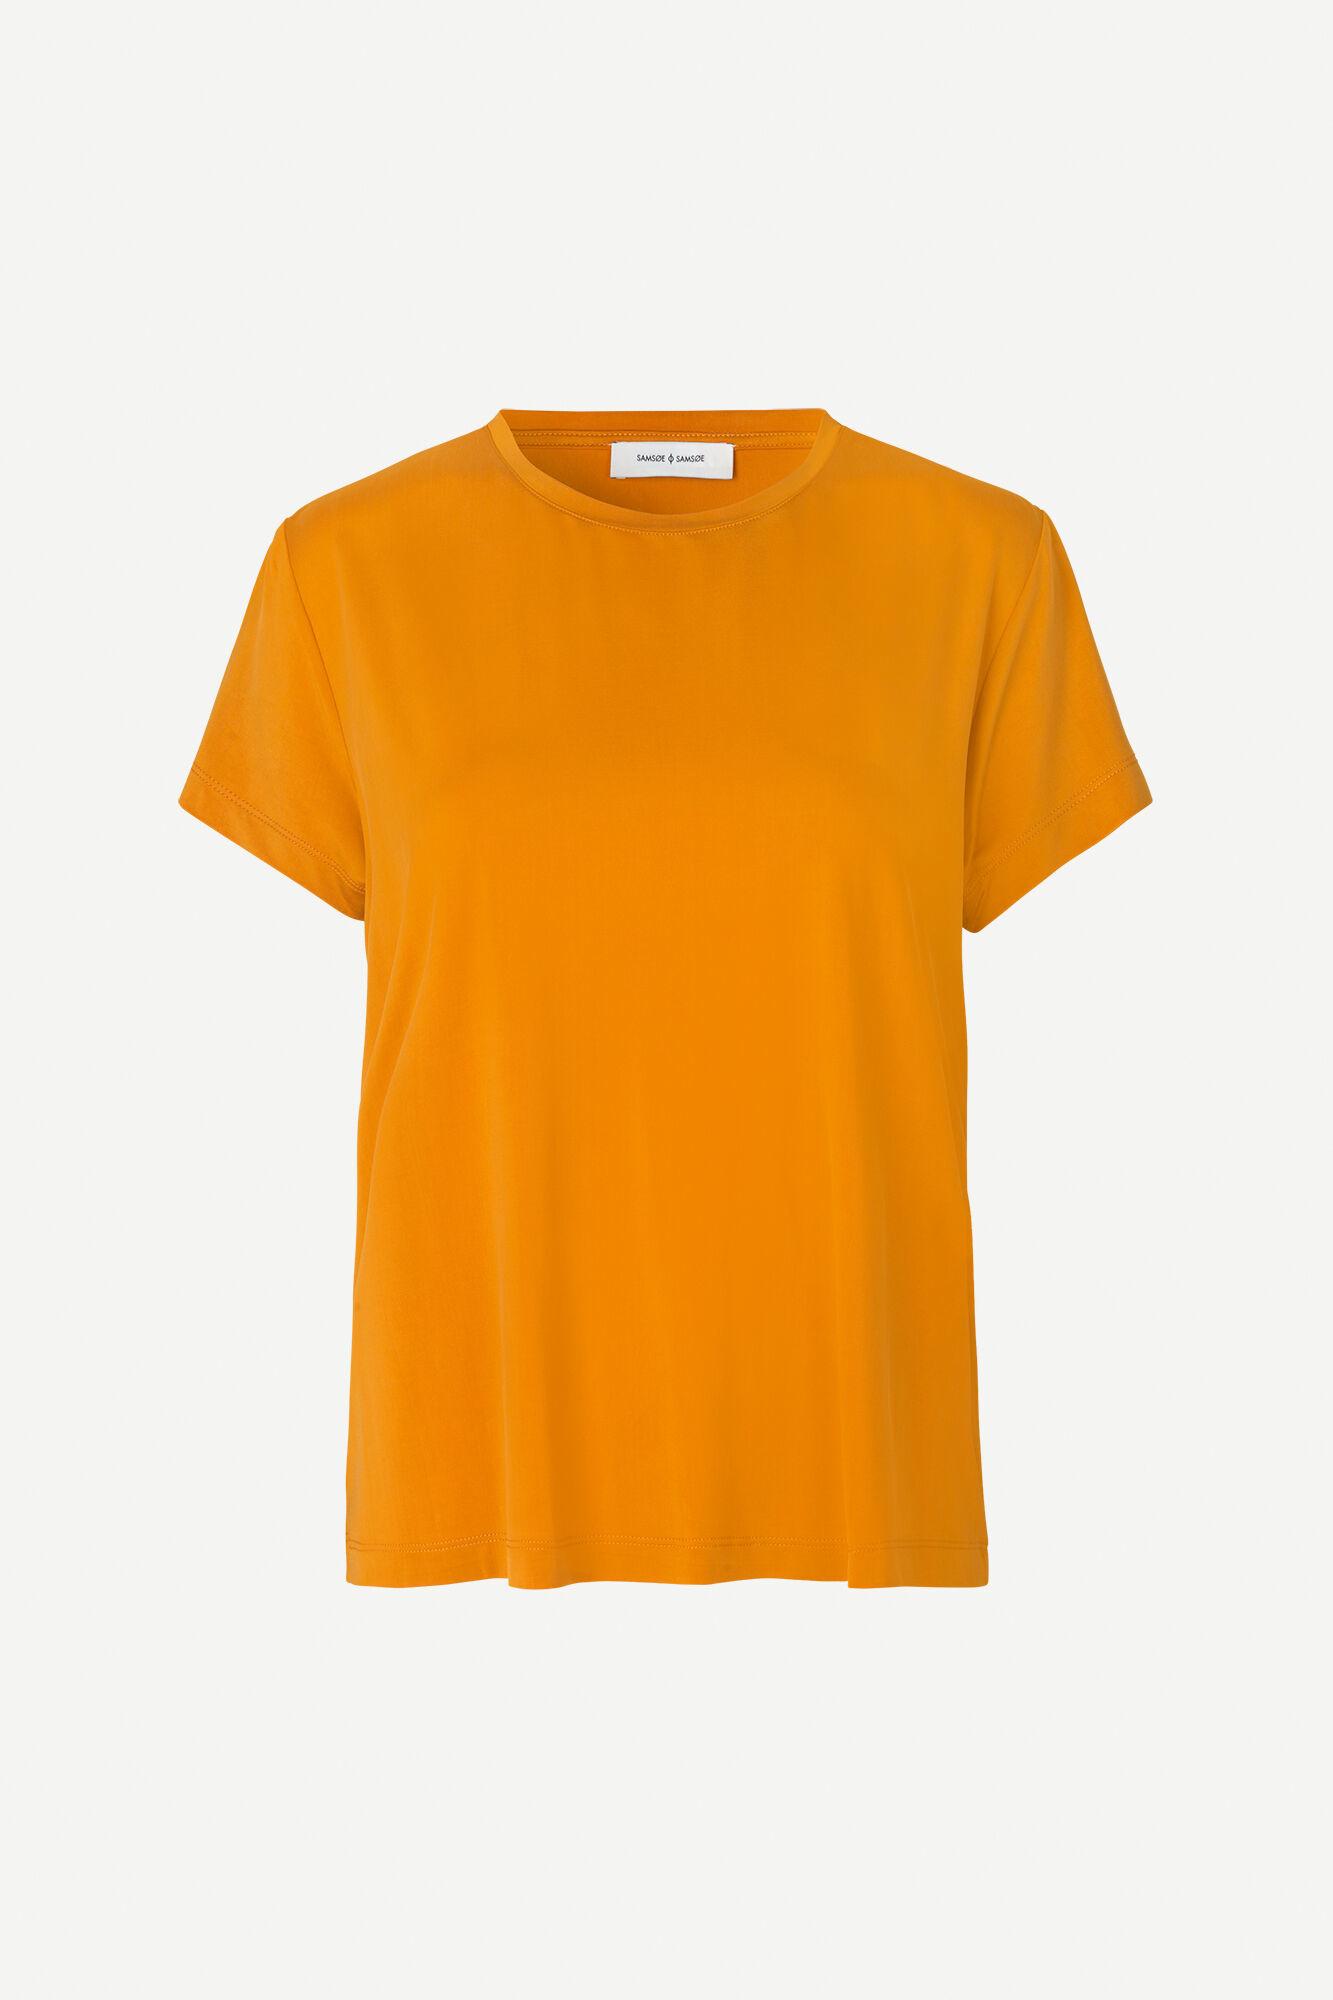 SAMSOE t-shirt siff-5